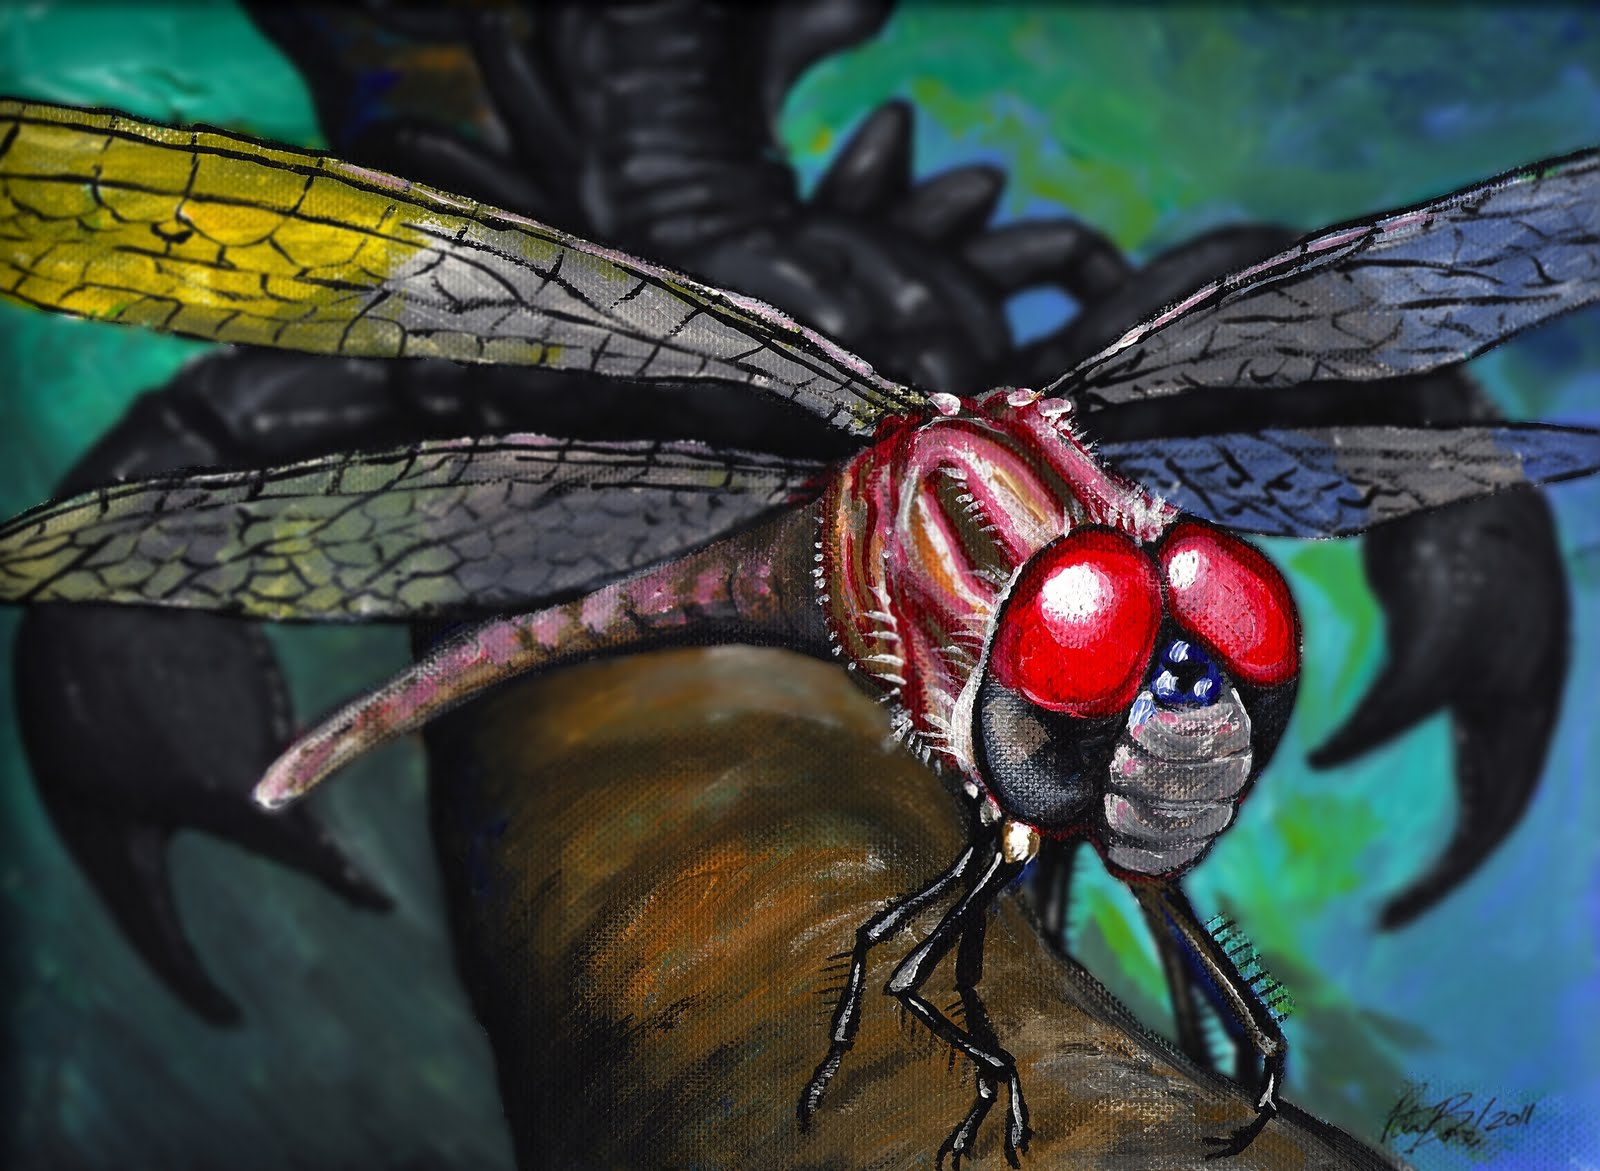 Giant dragonfly carboniferous